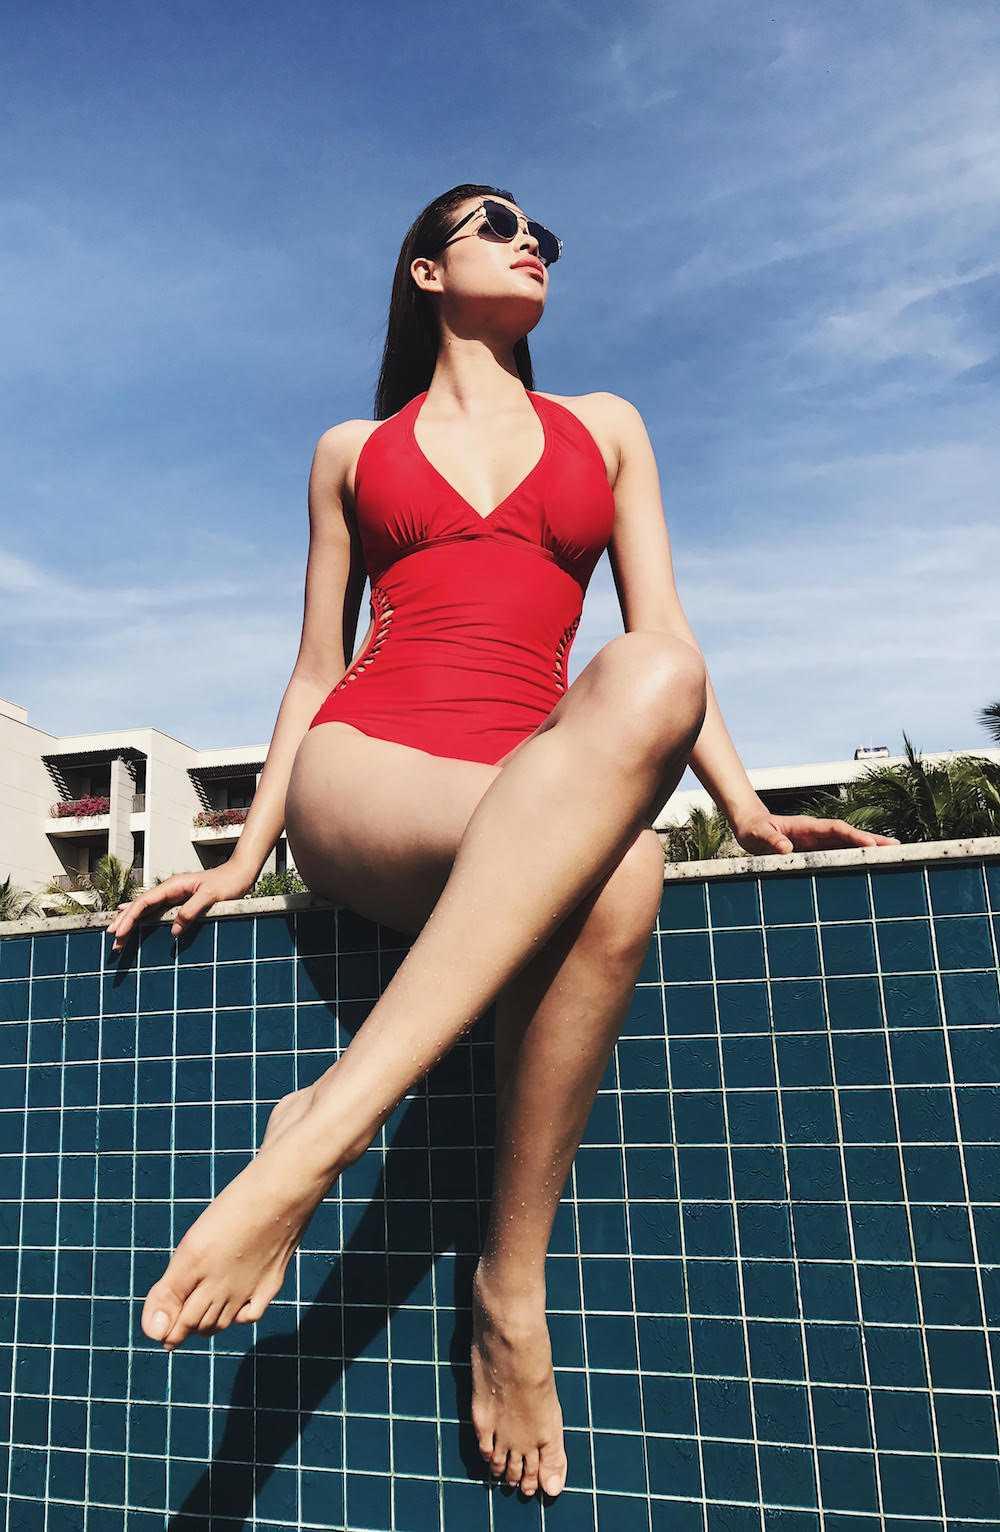 Pham Huong 'nong ray' voi bikini, khoe vong eo 59cm hinh anh 1